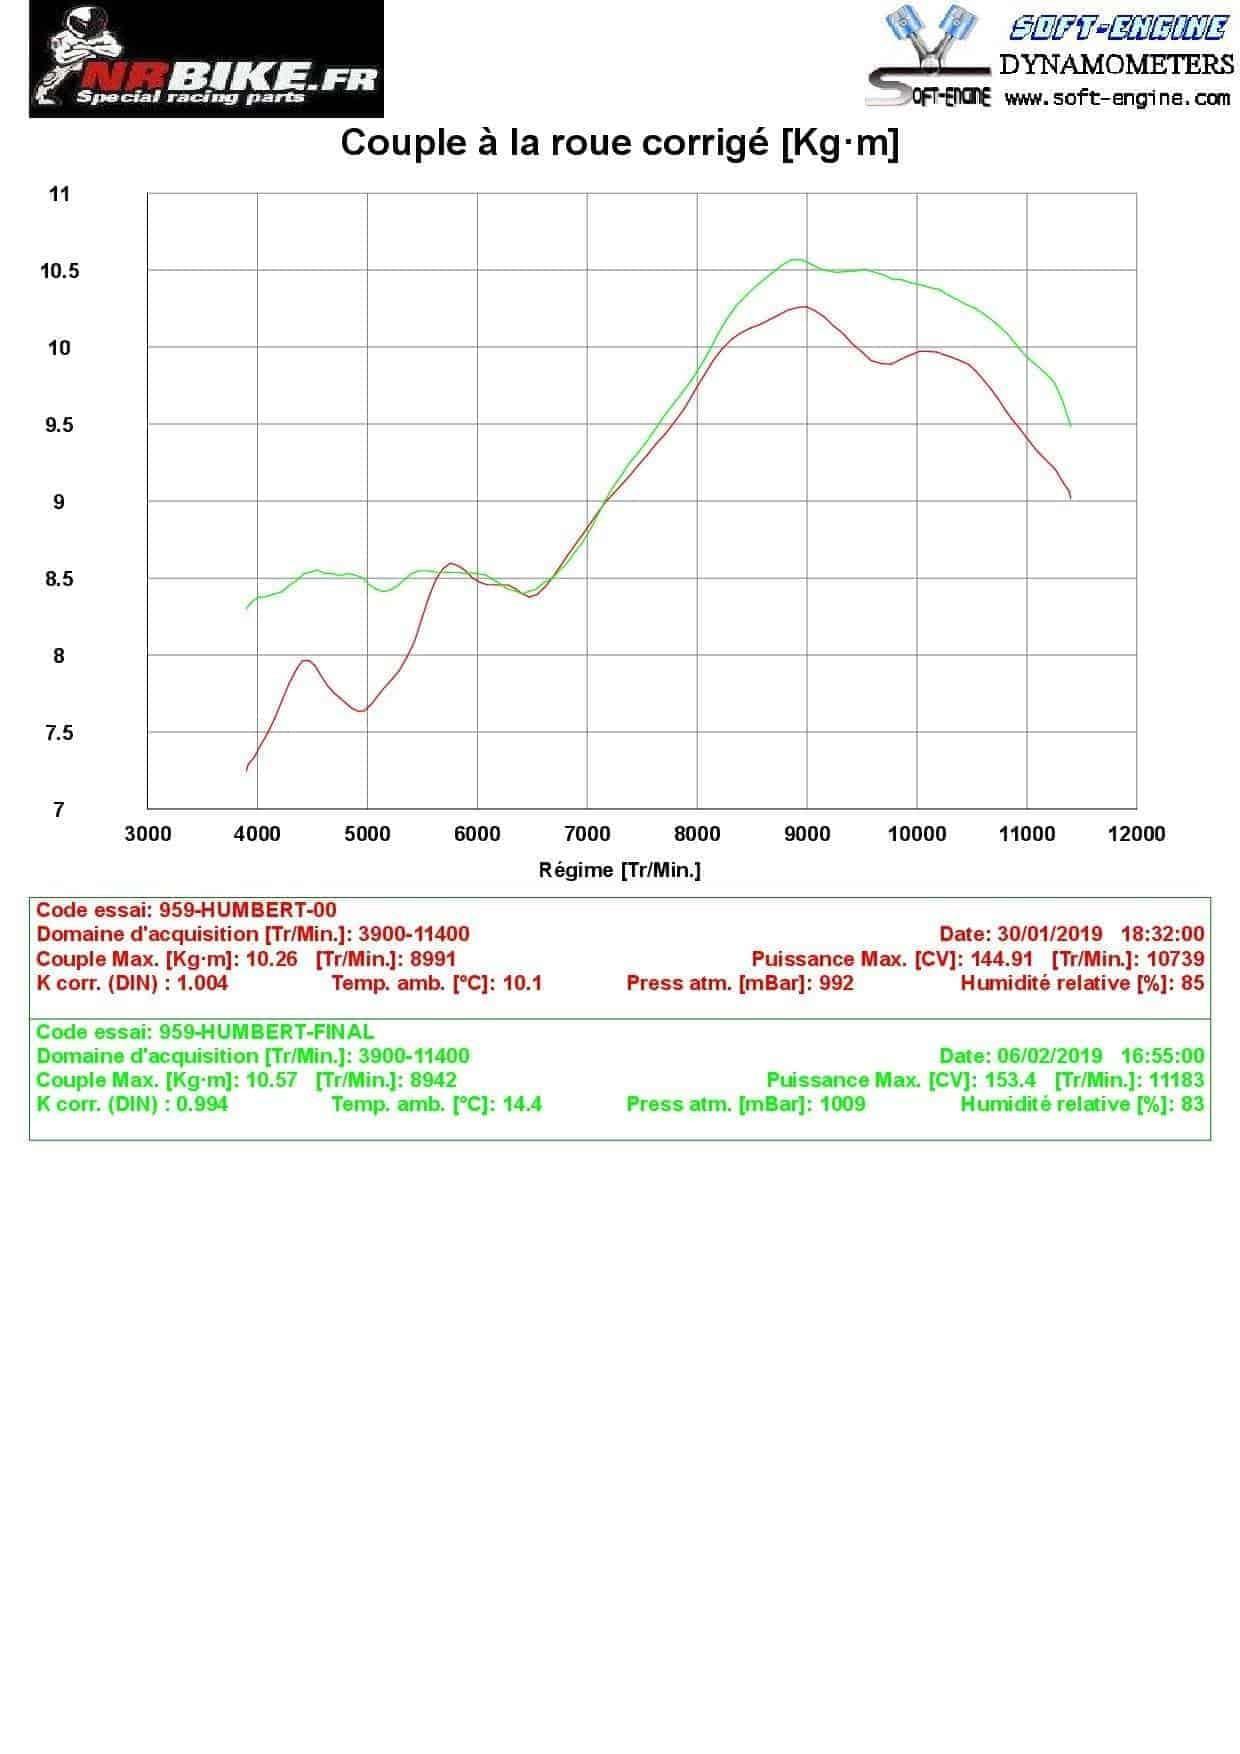 comparaison map ducati perf / map nrbike -  couple